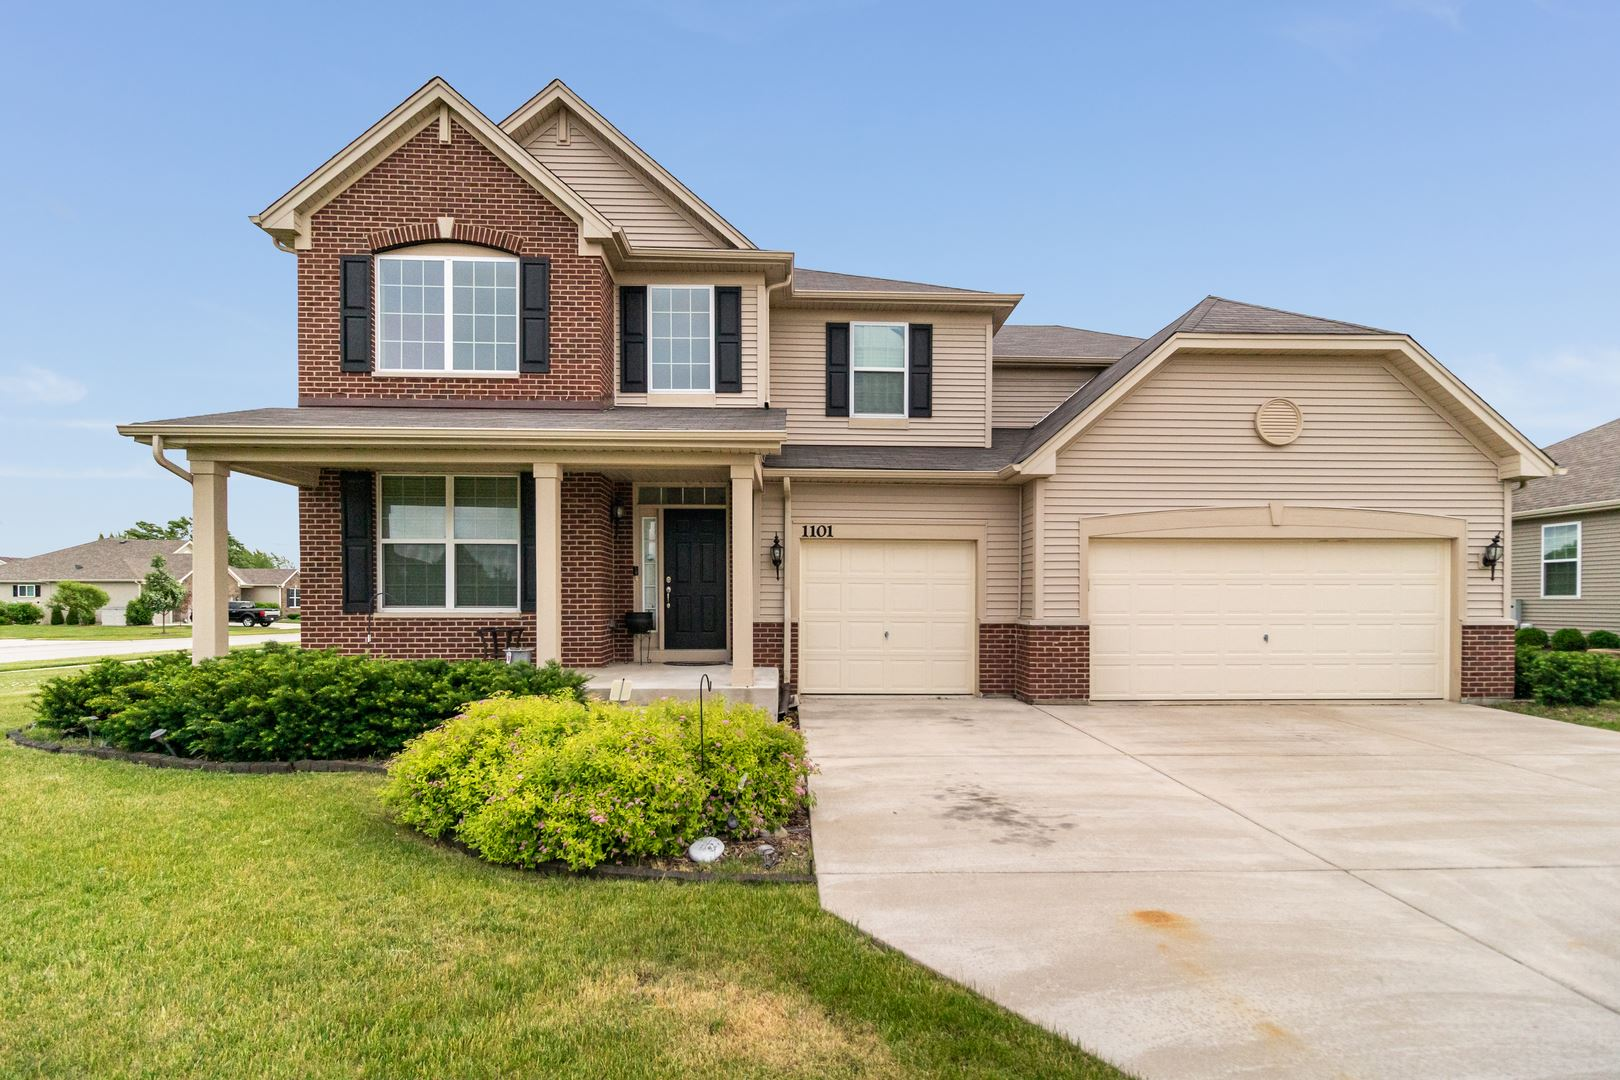 1101 Highland Drive, Shorewood, IL 60404 - #: 10772145